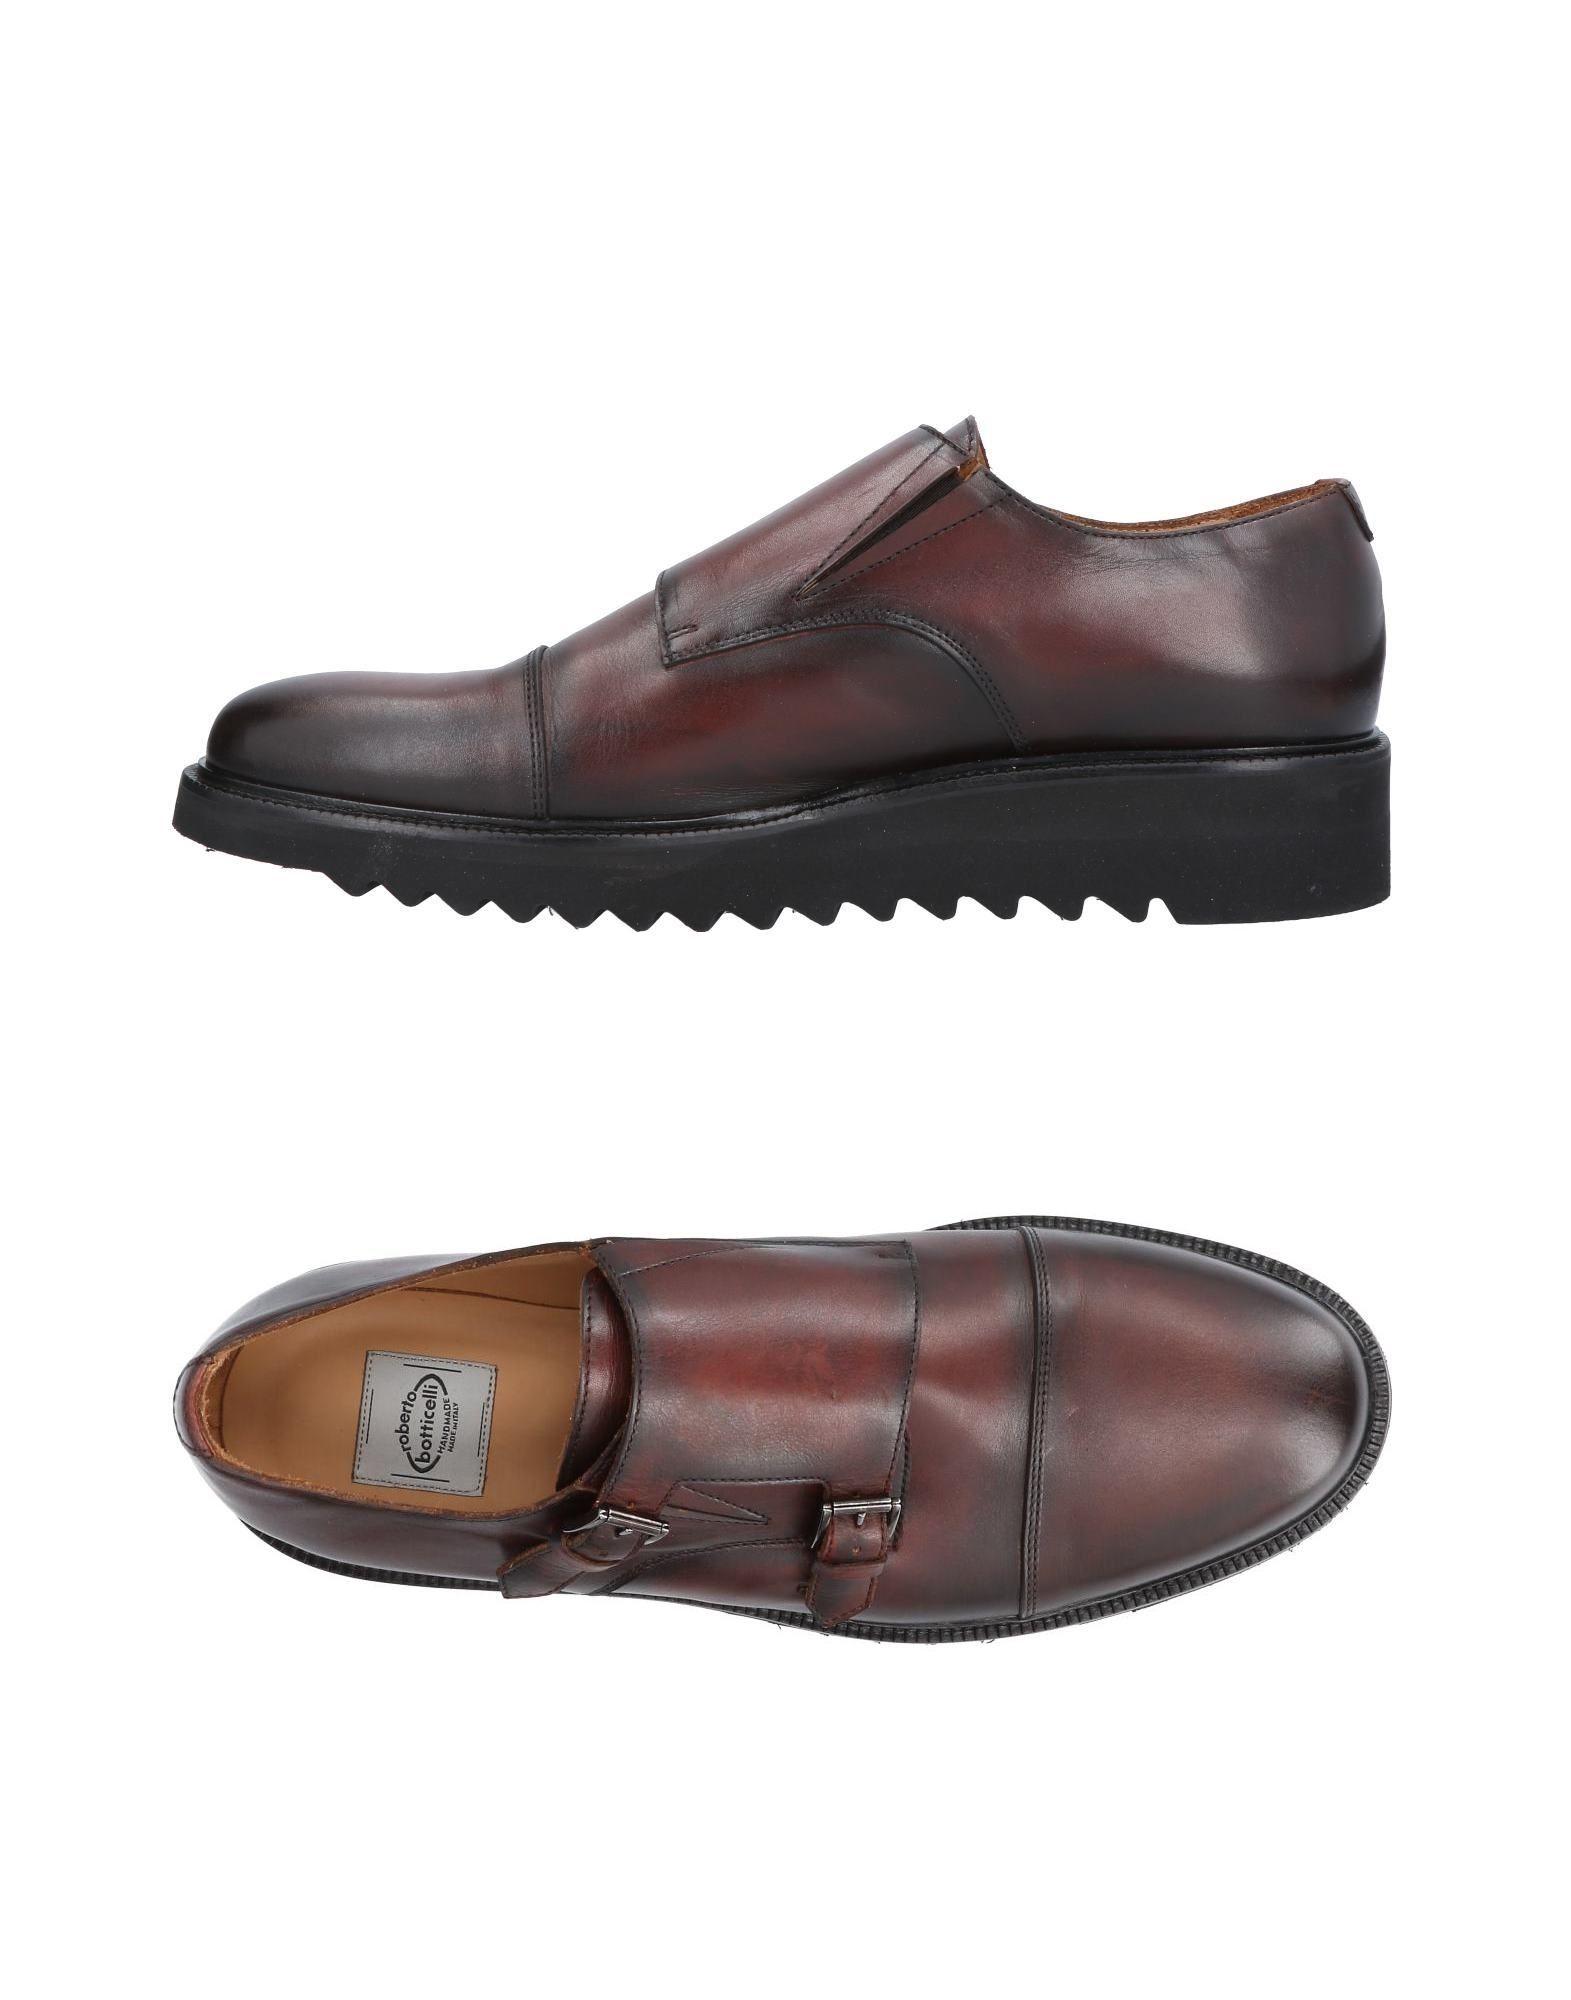 Roberto Botticelli Mokassins Herren  11467830XG Gute Qualität beliebte Schuhe